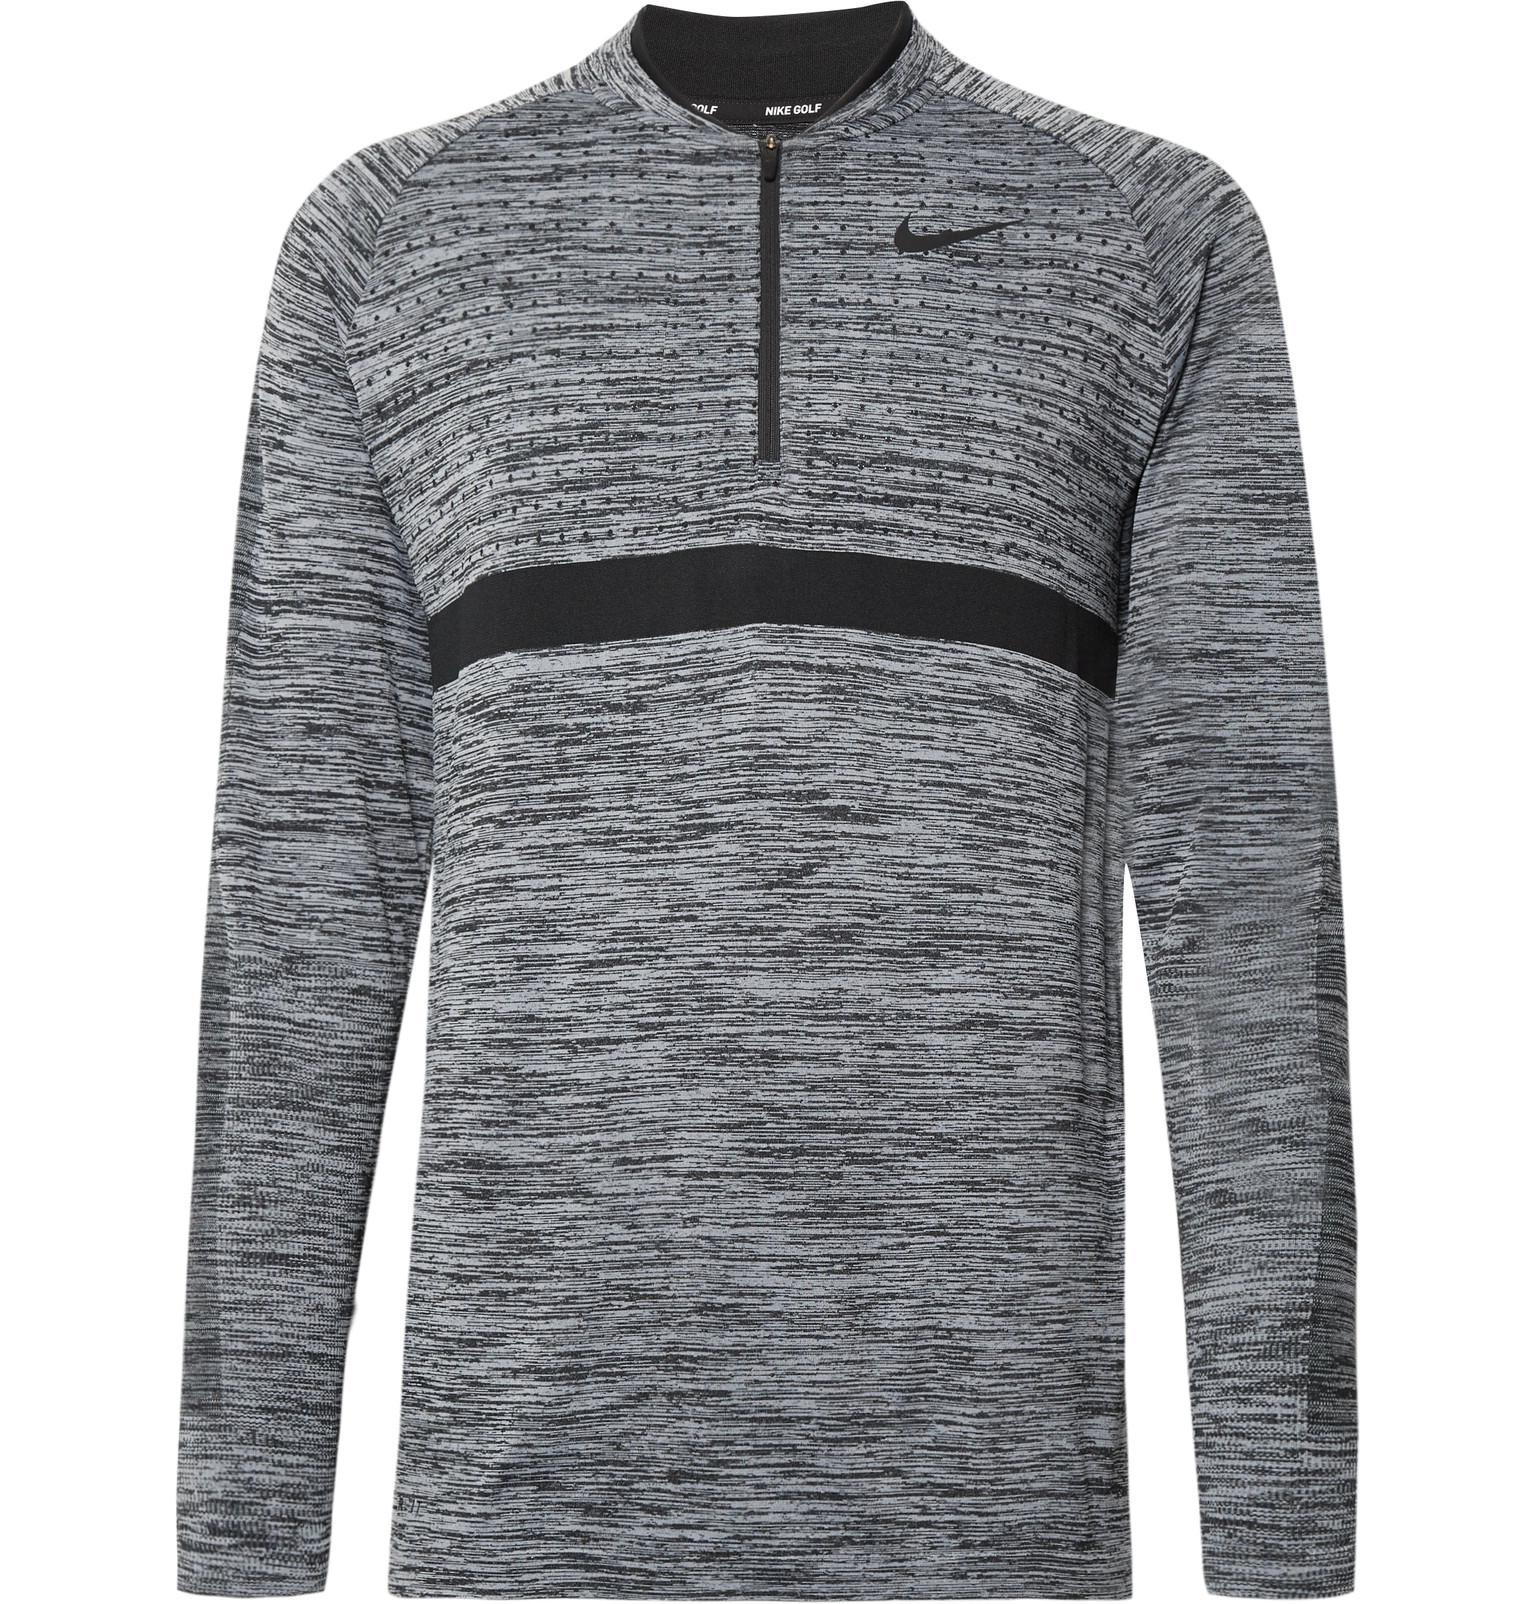 191a773fc74a Lyst - Nike Mélange Dri-fit Half-zip Golf Top in Gray for Men